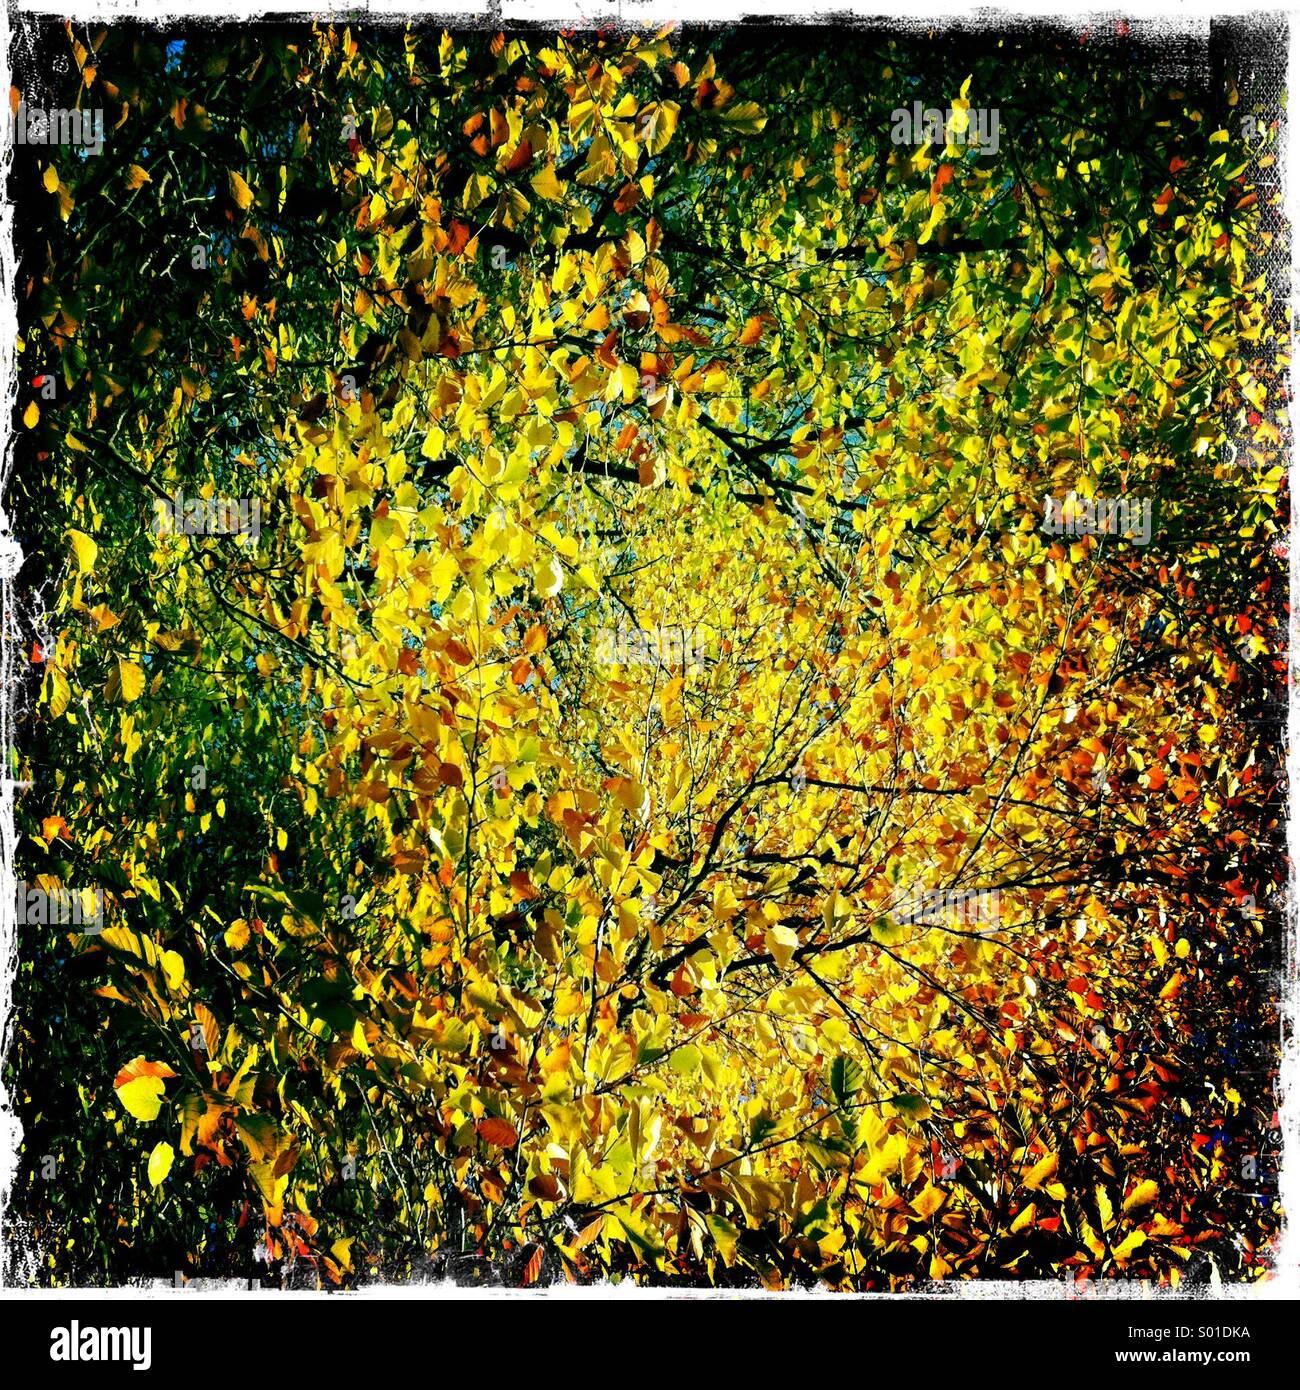 Golden autumn colour - Stock Image